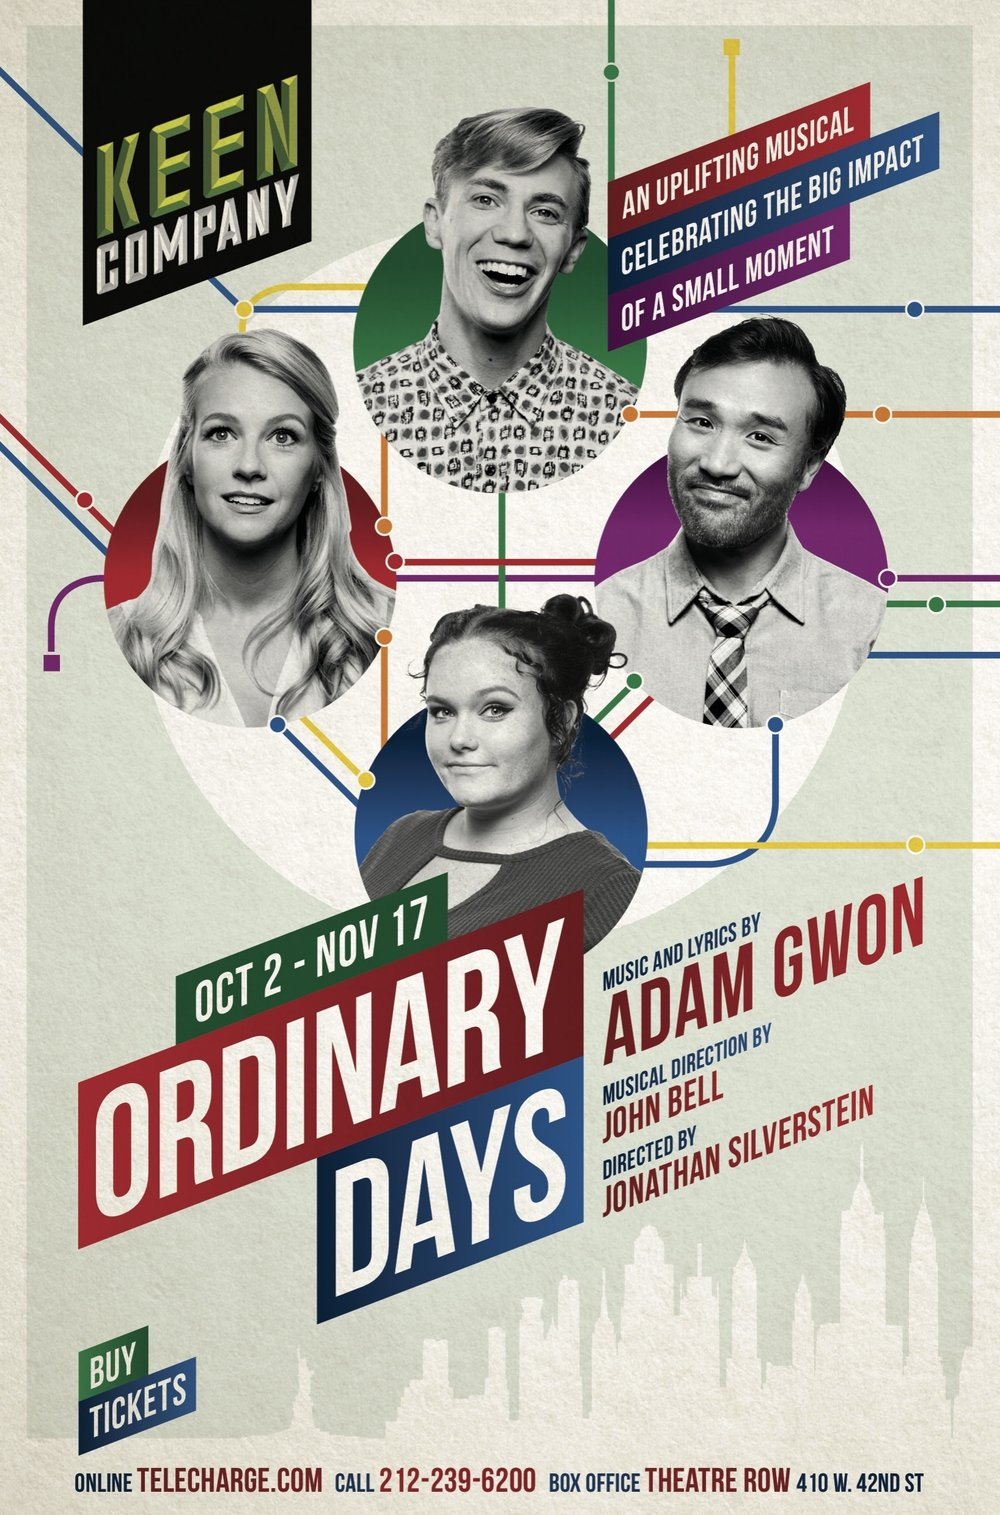 KEEN ORDINARY DAYS AD.jpg